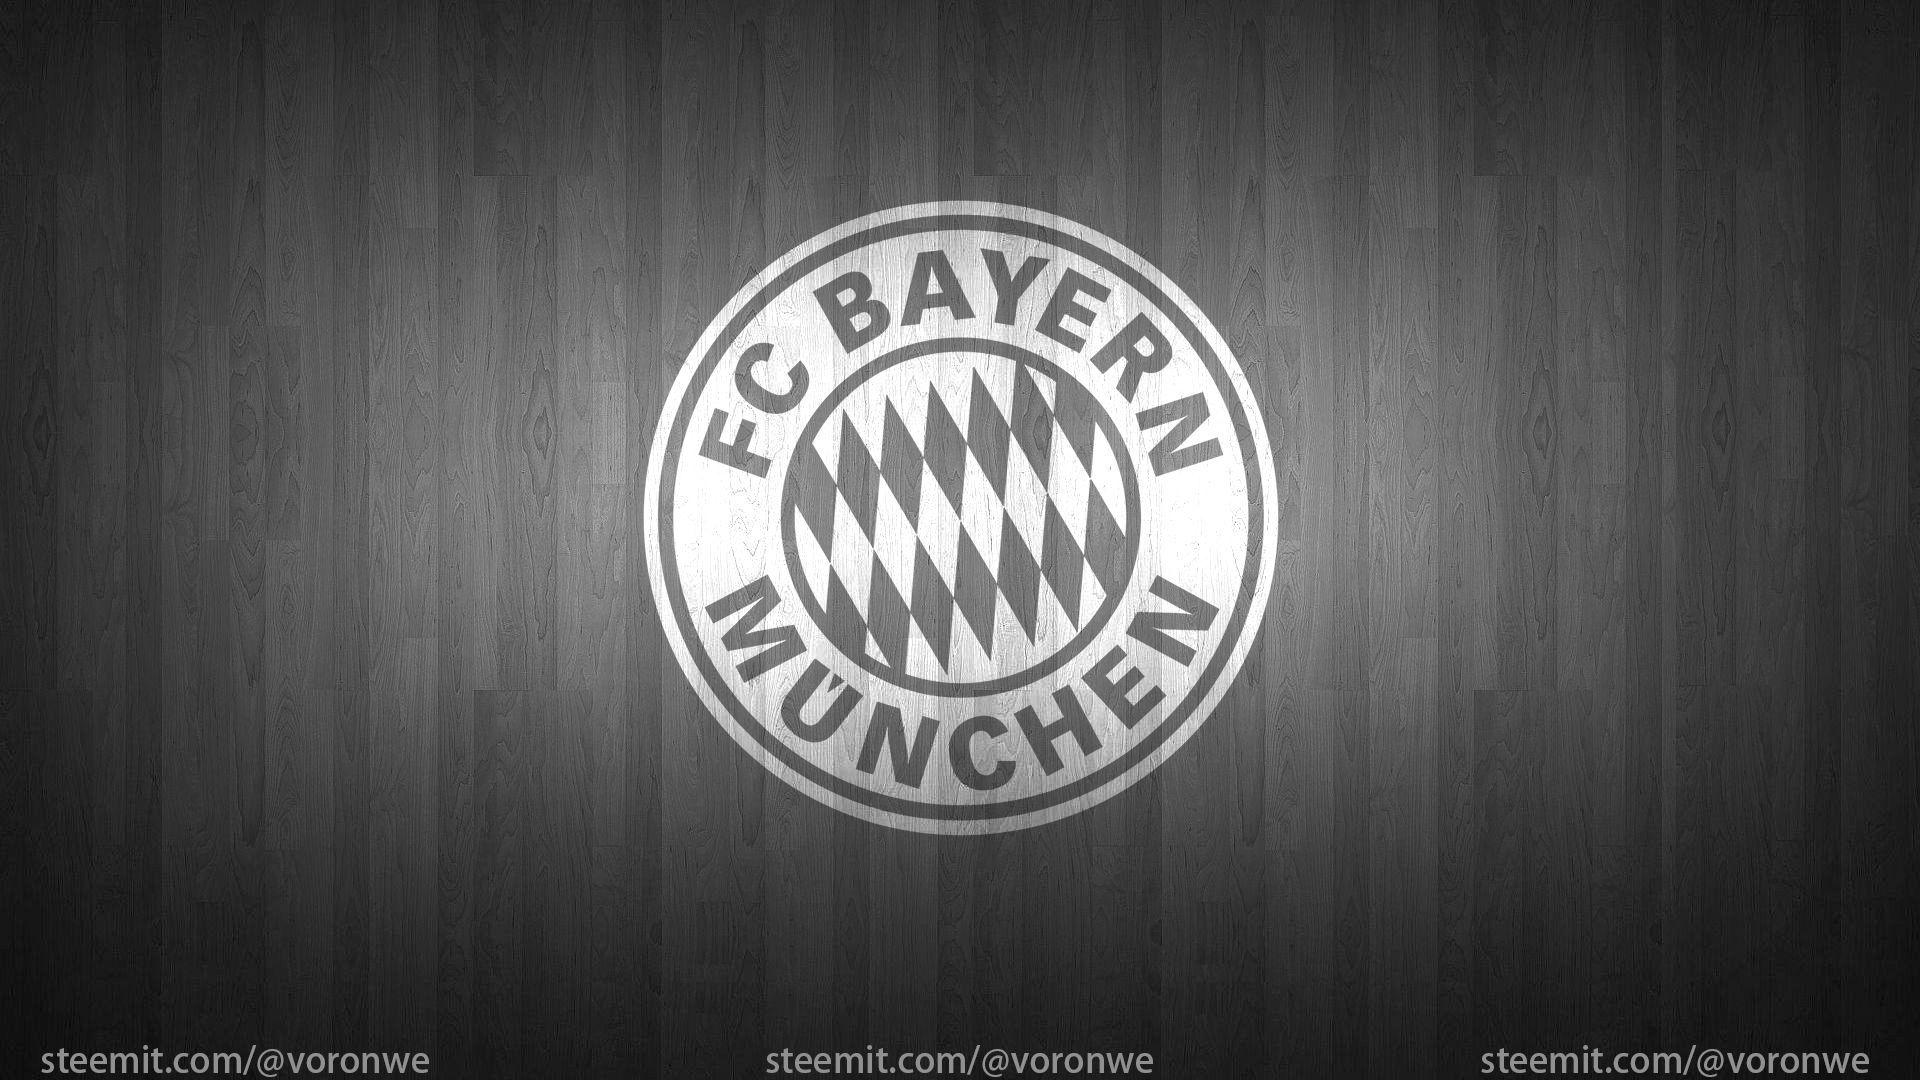 Bayern Munich Black And White Logo Wallpapers - Wallpaper Cave